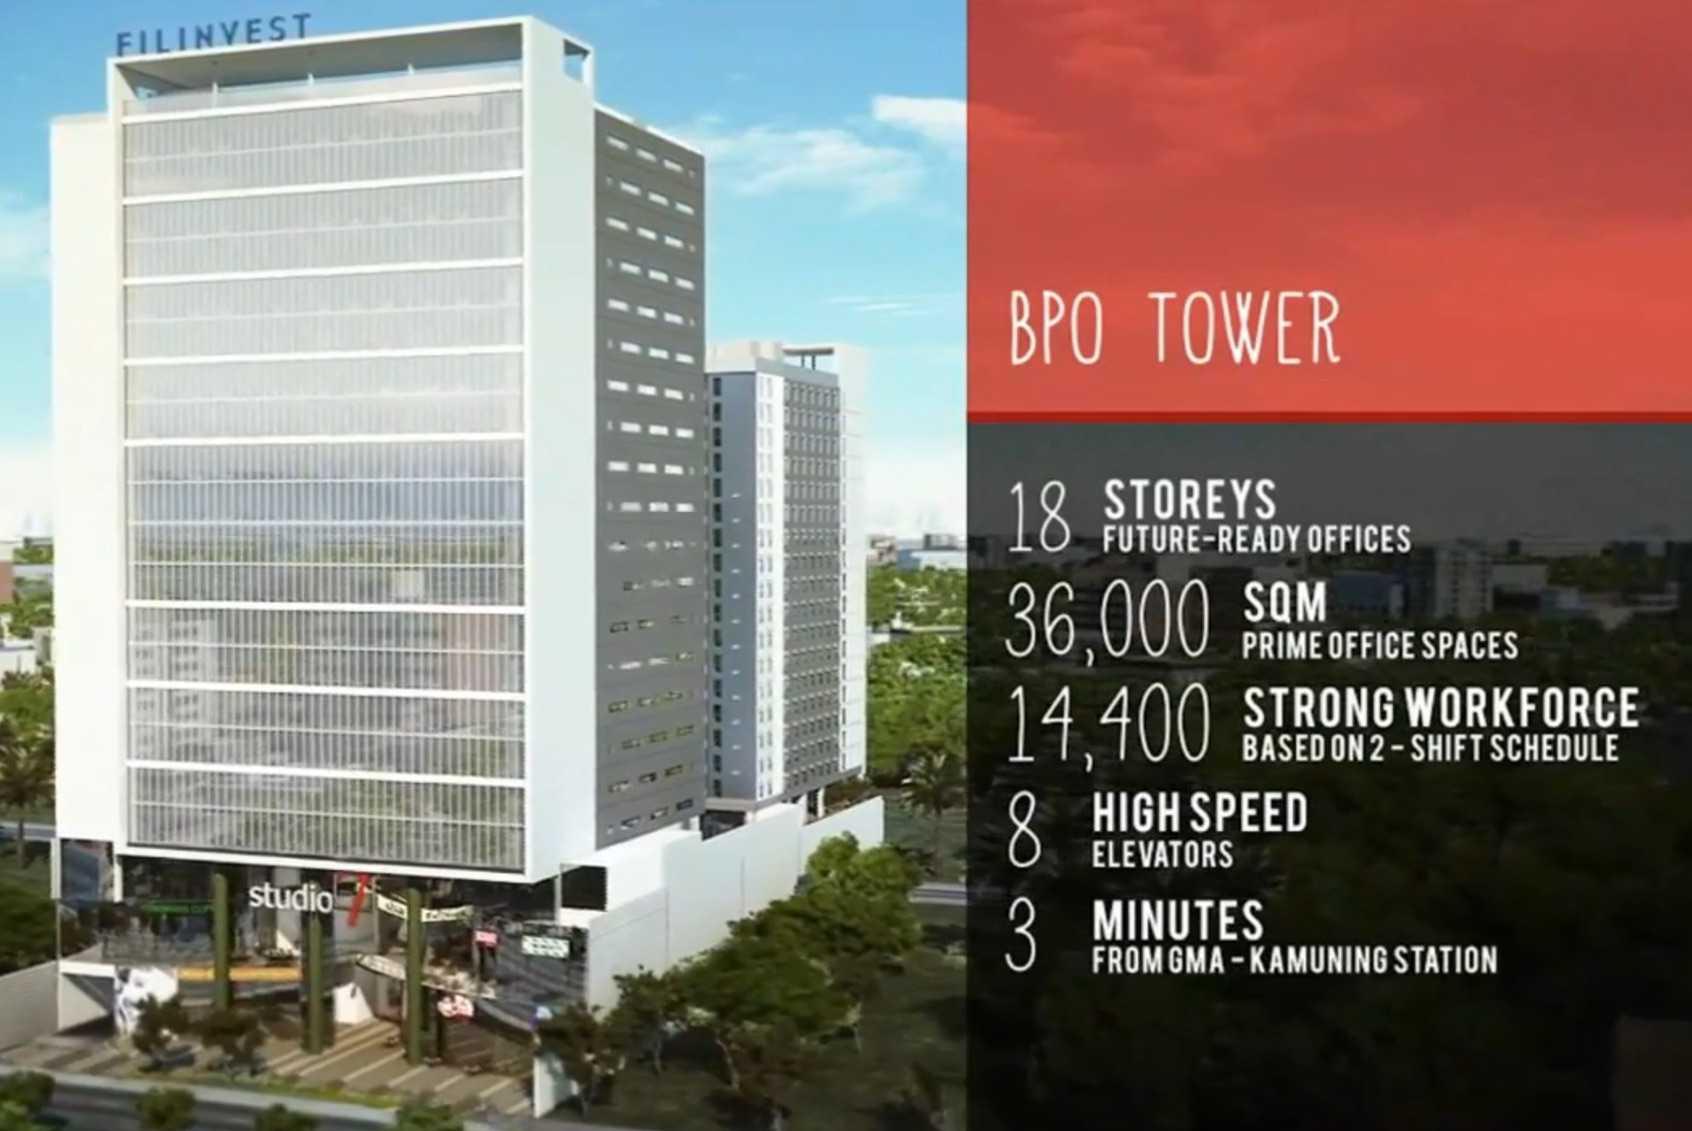 Studio-7-Manila-BPO